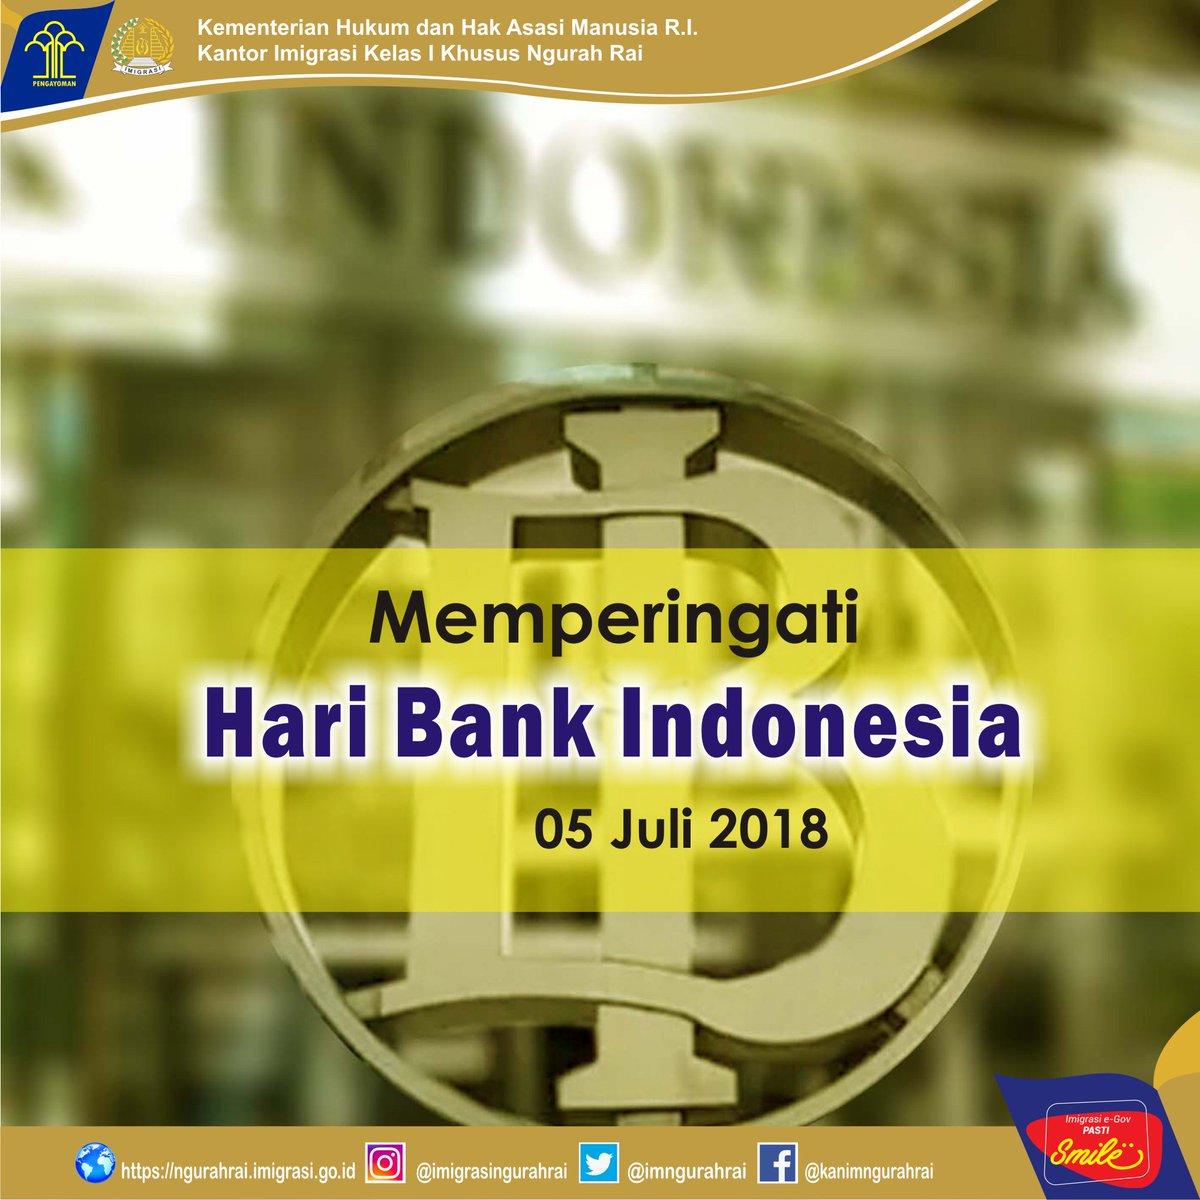 Hai sobat Mido Midi,  Tau ga tgl 5 Juli diperingati sebagai hari apa? Yap, betul Hari Bank Indonesia.  . Selamat Hari Bank Indonesia! Semoga perbankan nasional semakin maju dan mampu mendorong kesejahteraan masyarakat. . #imigrasingurahrai  #imigrasi #haribankindonesia